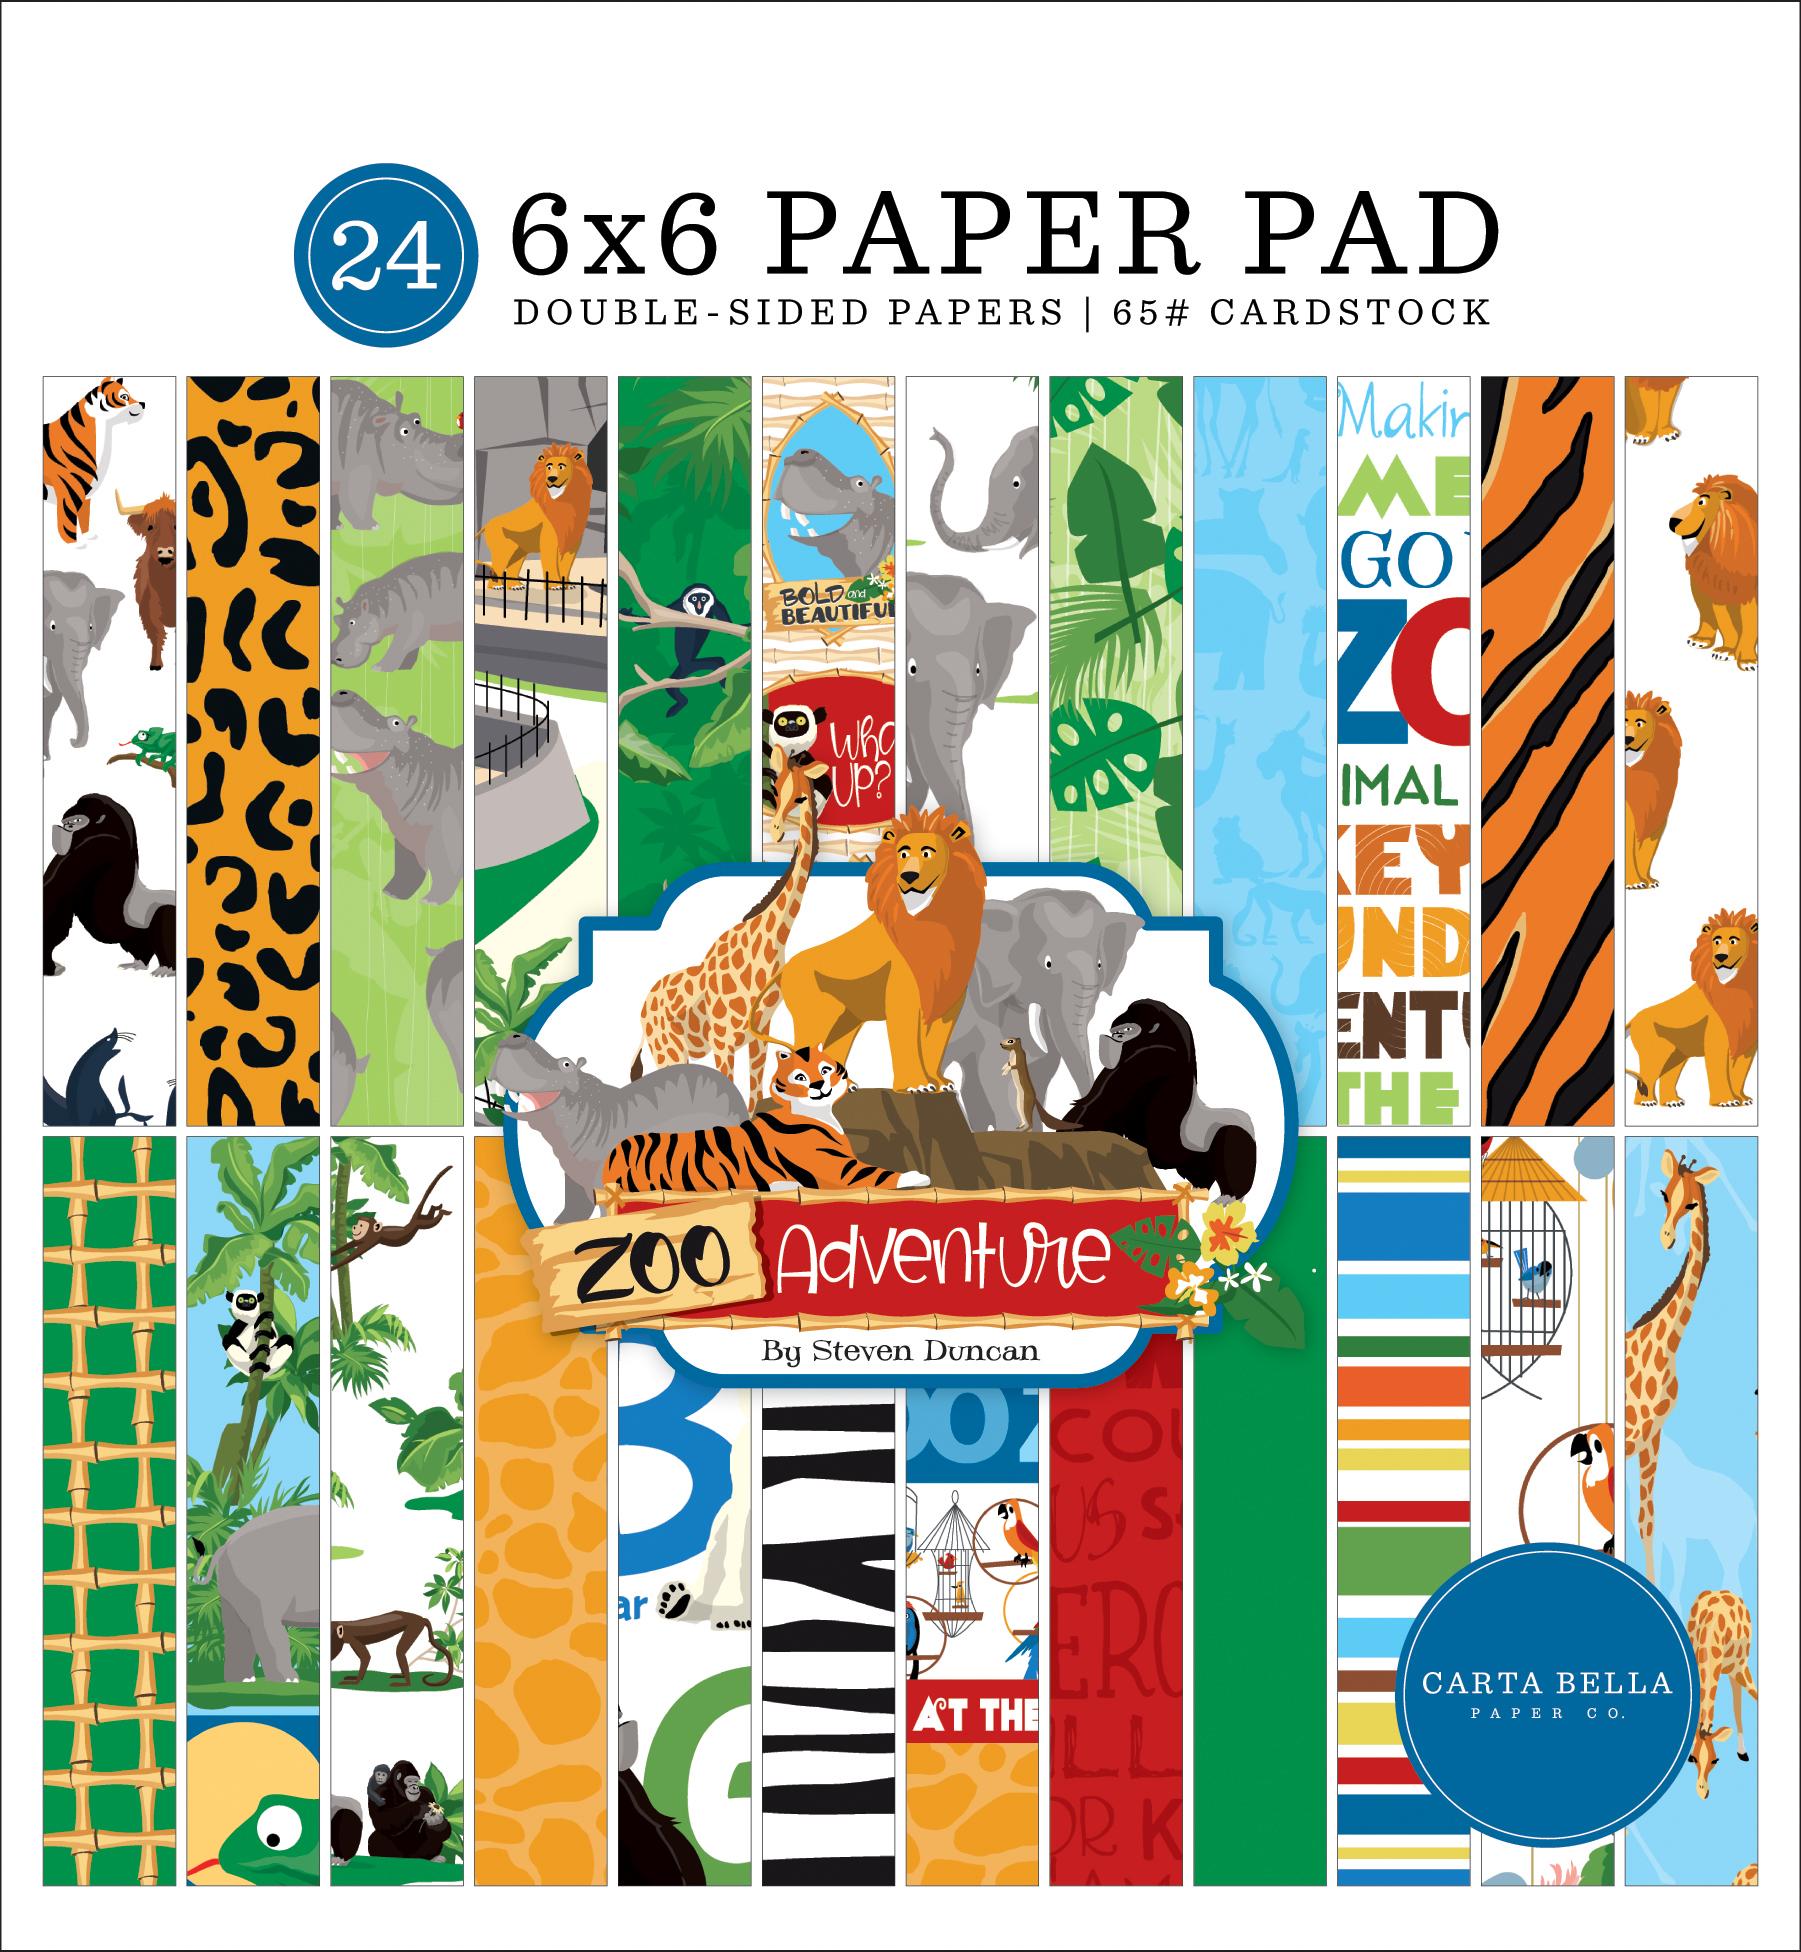 Zoo Adventure: 6x6 Paper Pad